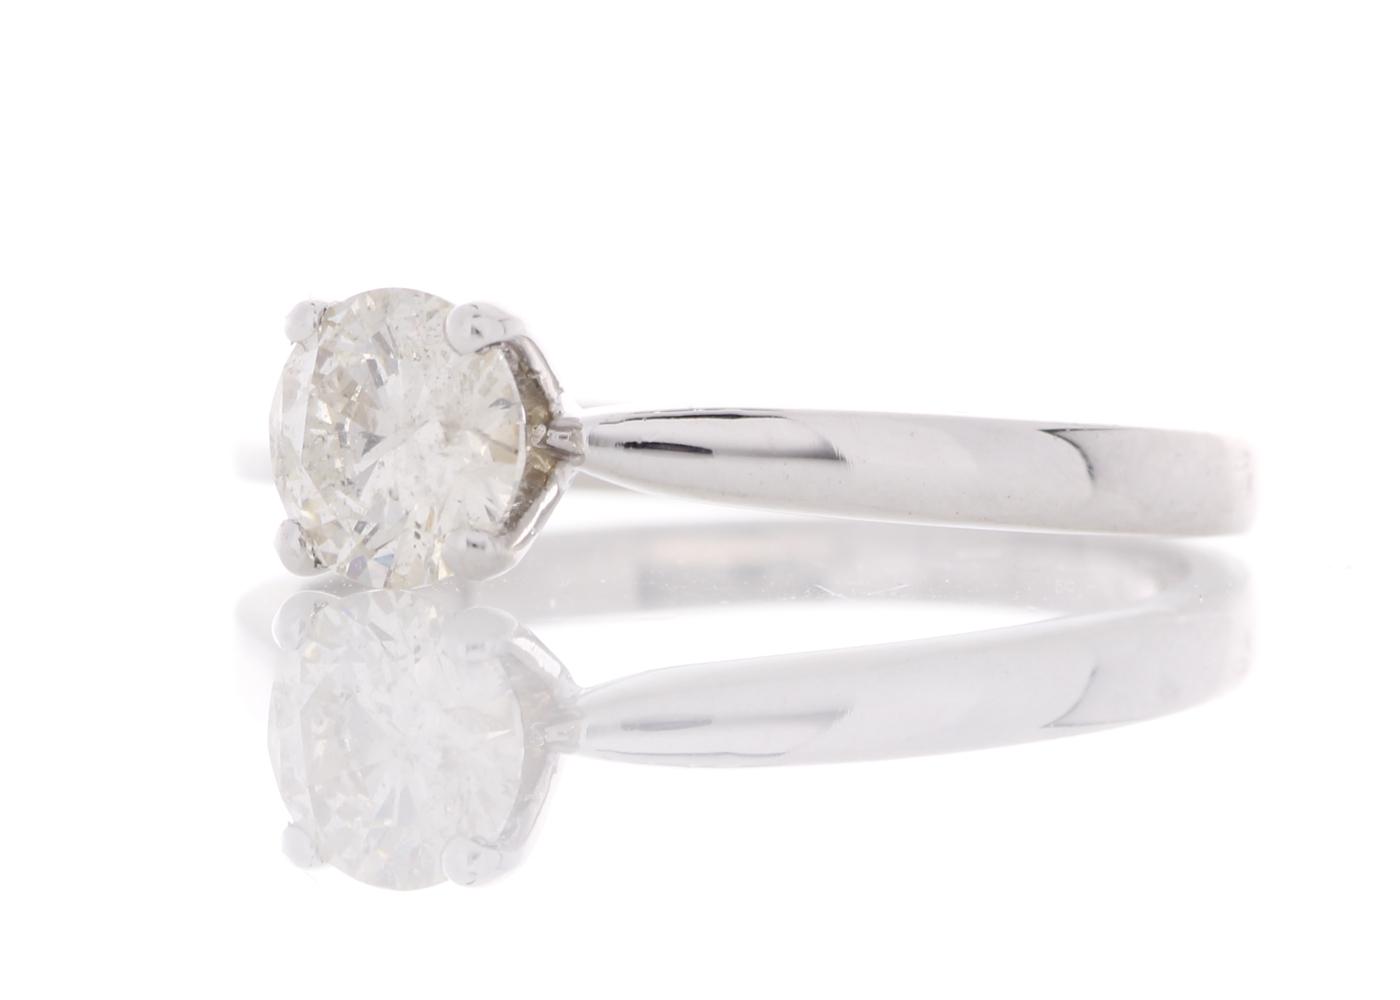 18k White Gold Prong Set Diamond Ring 0.57 Carats - Image 2 of 5